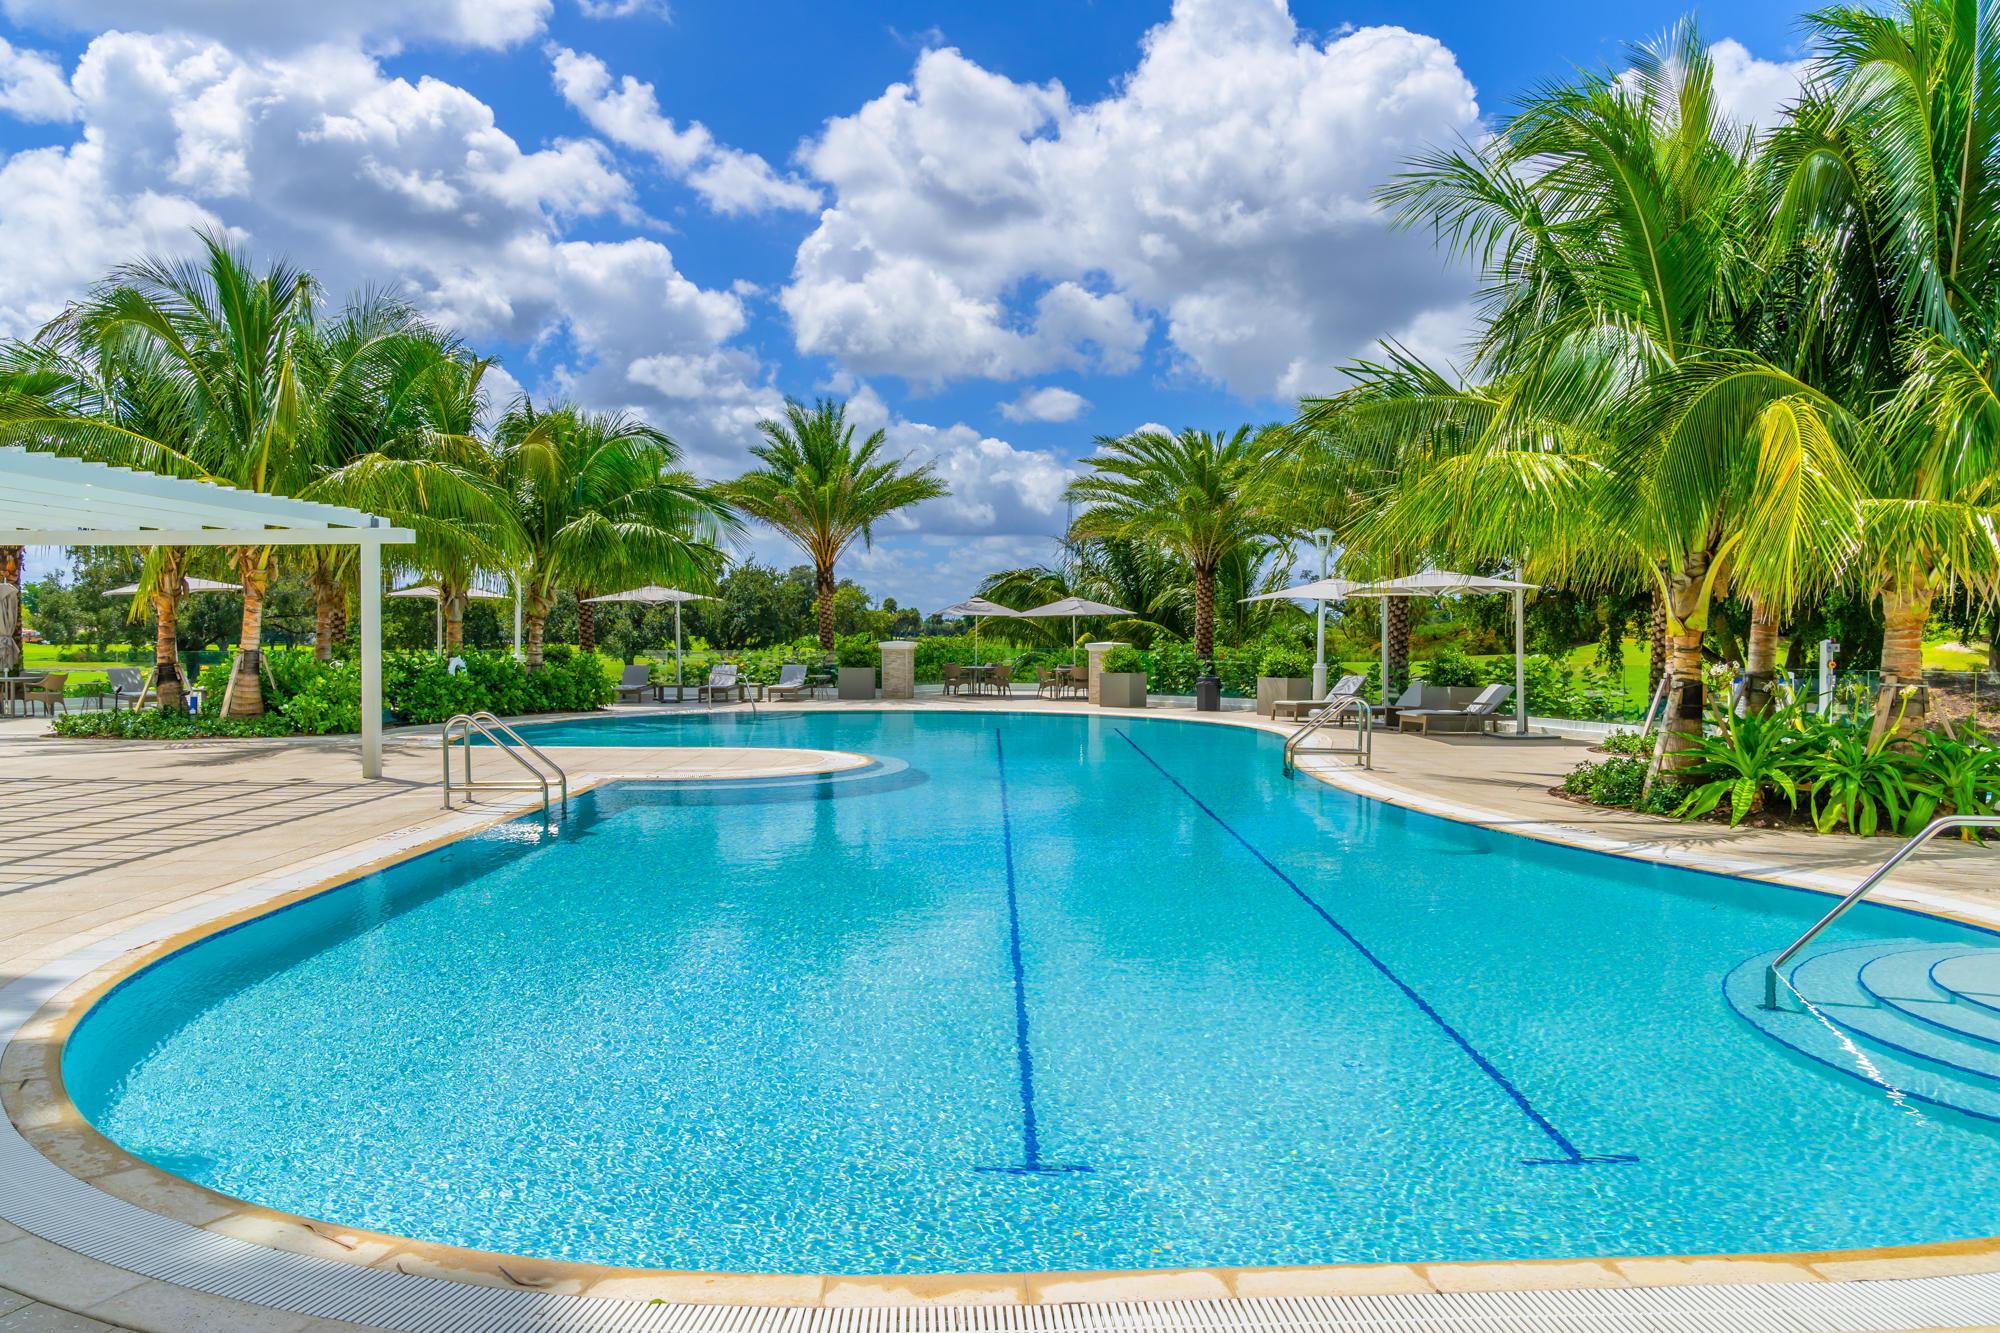 20155 Boca West Drive, B403 - Boca Raton, Florida